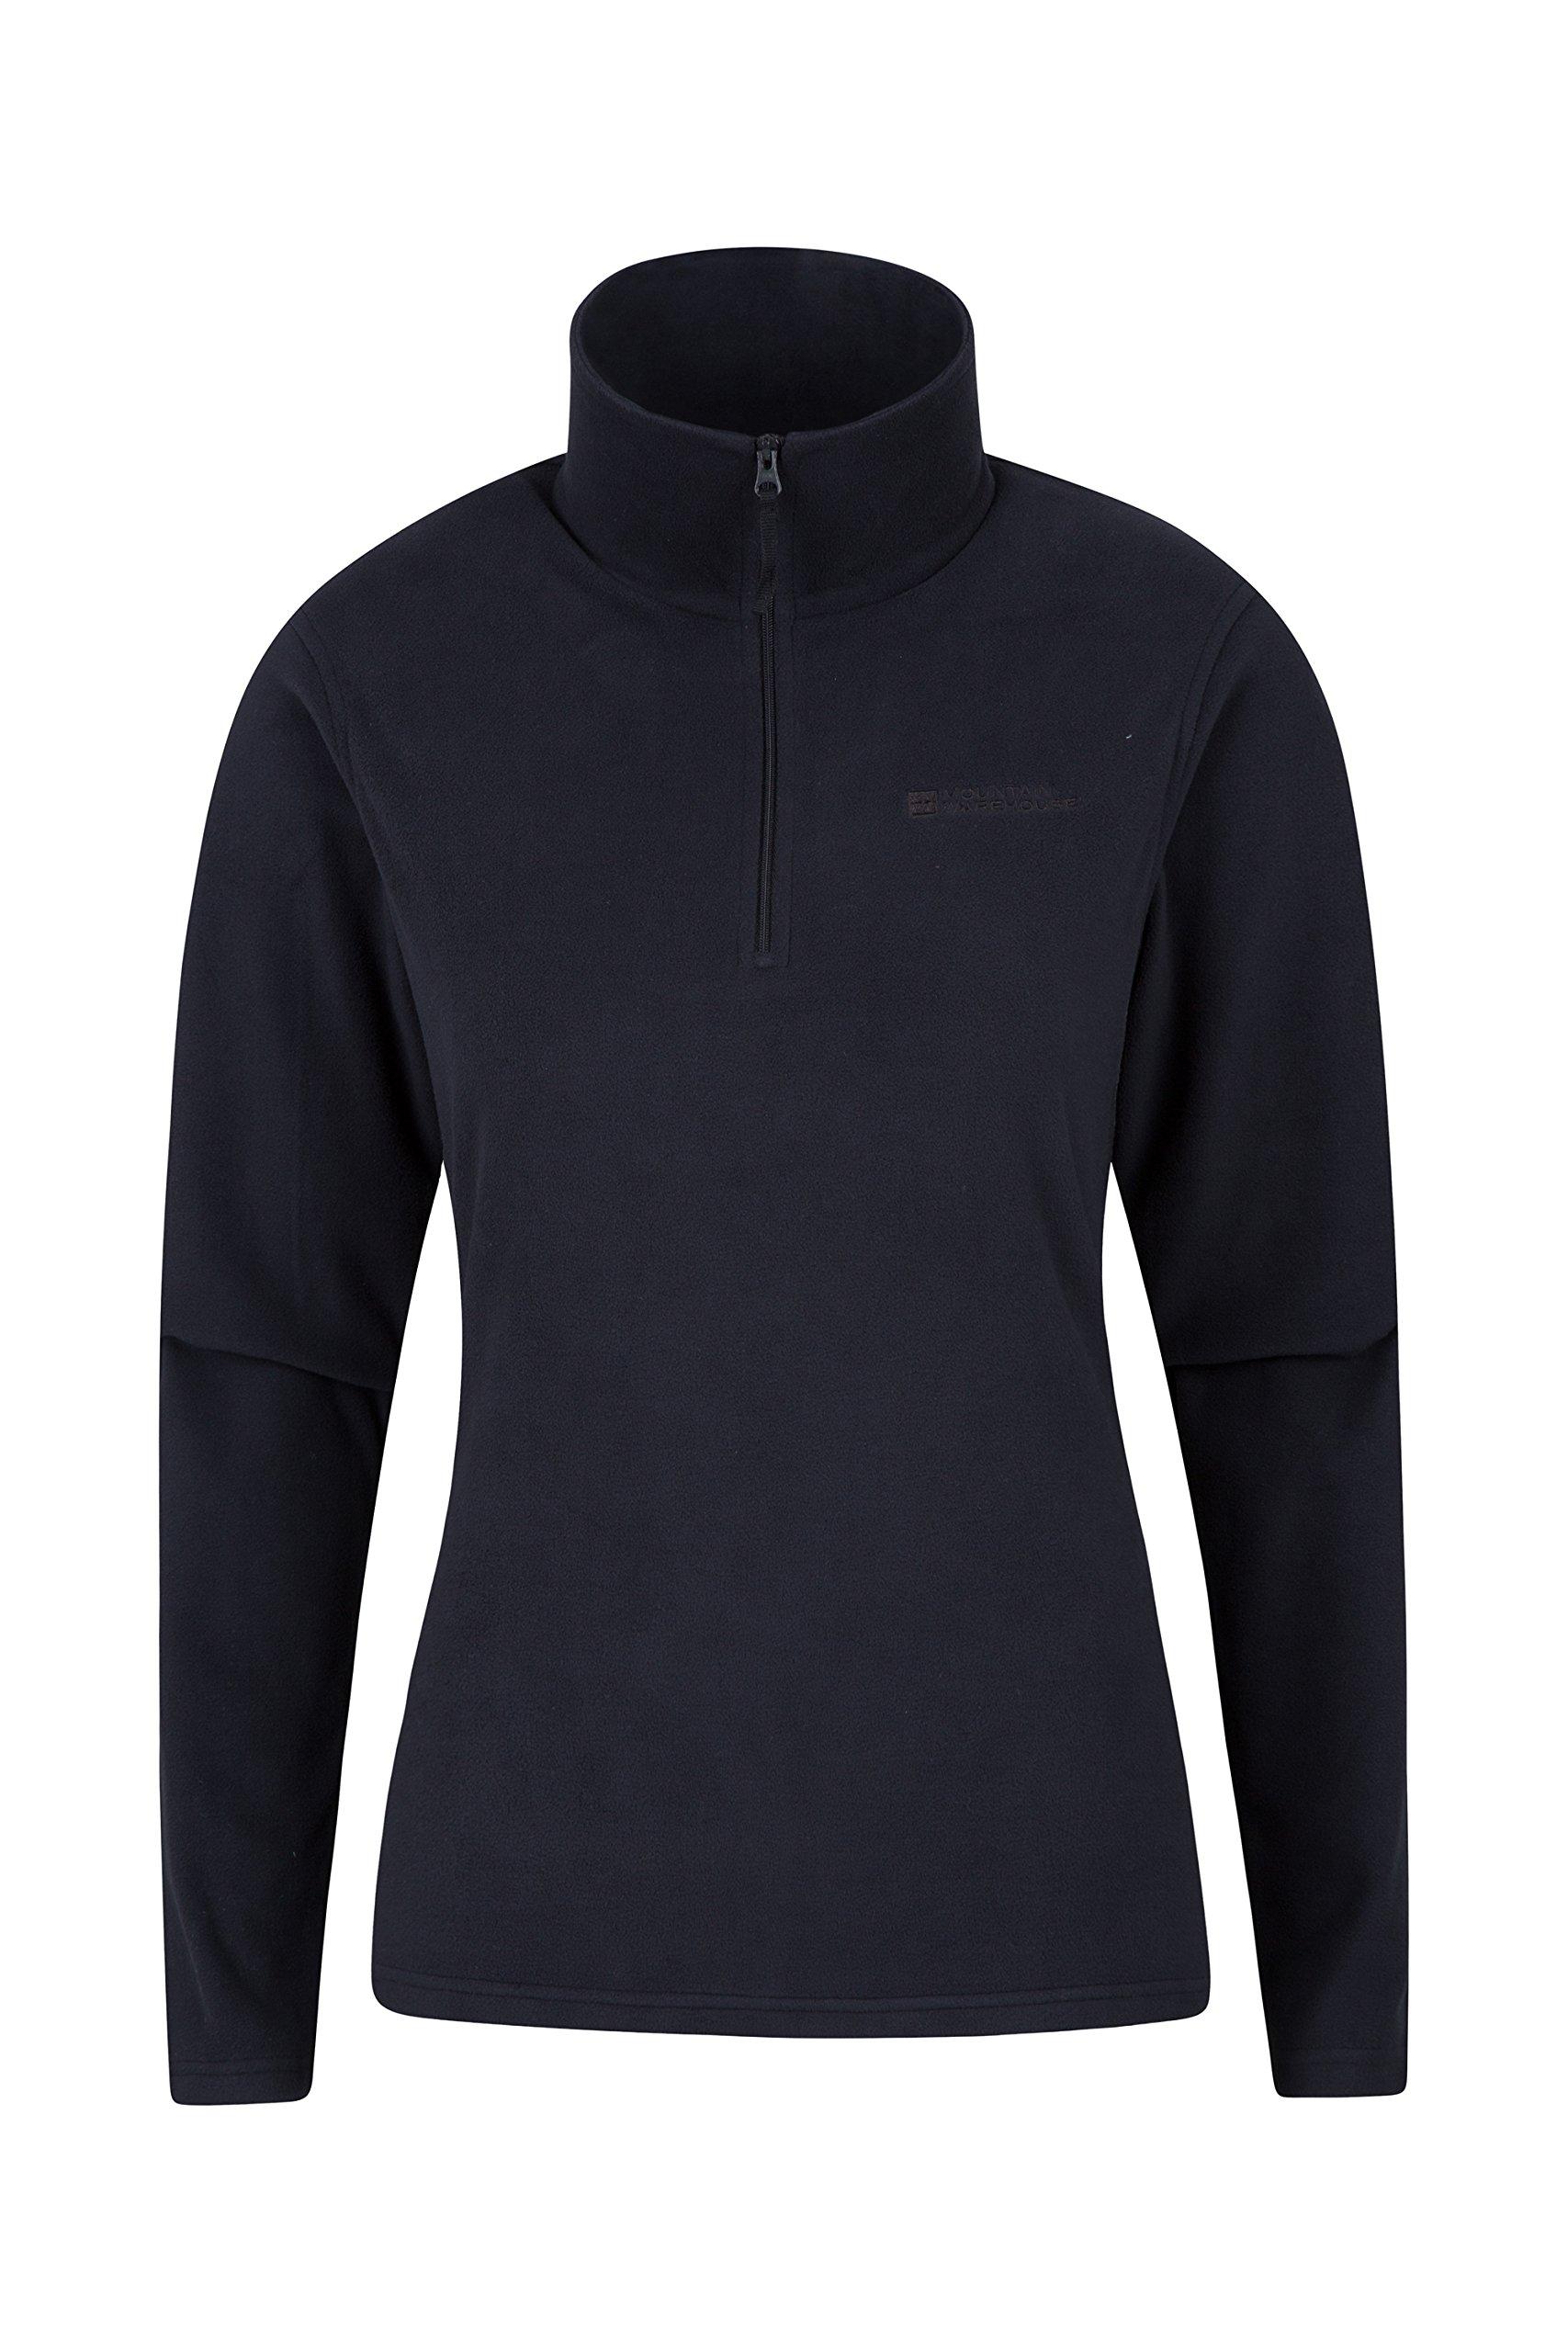 Mountain Warehouse Camber Womens Fleece Jacket -Breathable Ladies Top Black 16